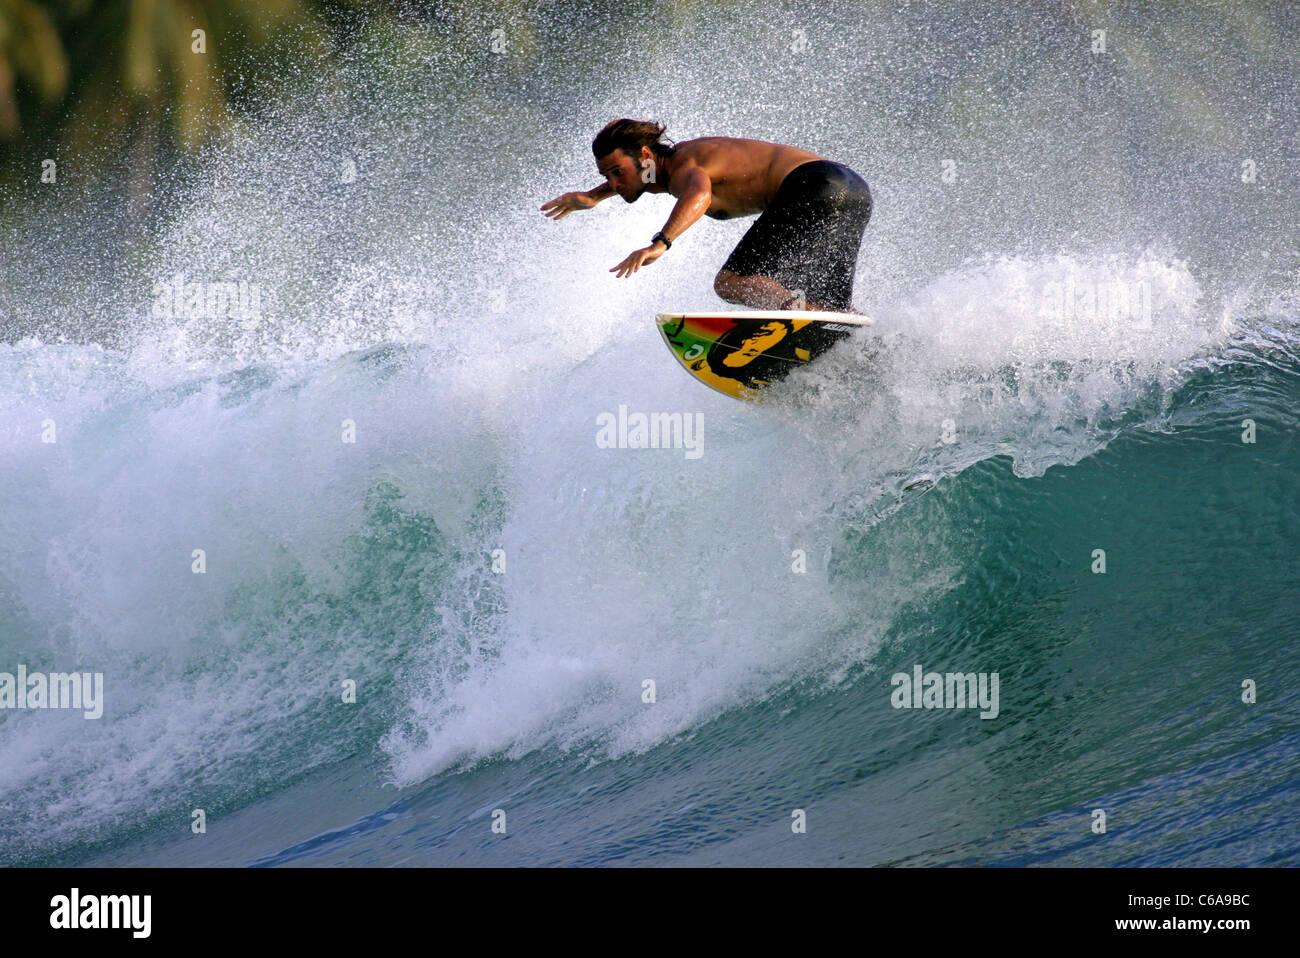 Surfing floater. Pulau Siberut, Mentawai Islands, West Sumatra, Sumatra, Indonesia, South-East Asia, Asia - Stock Image